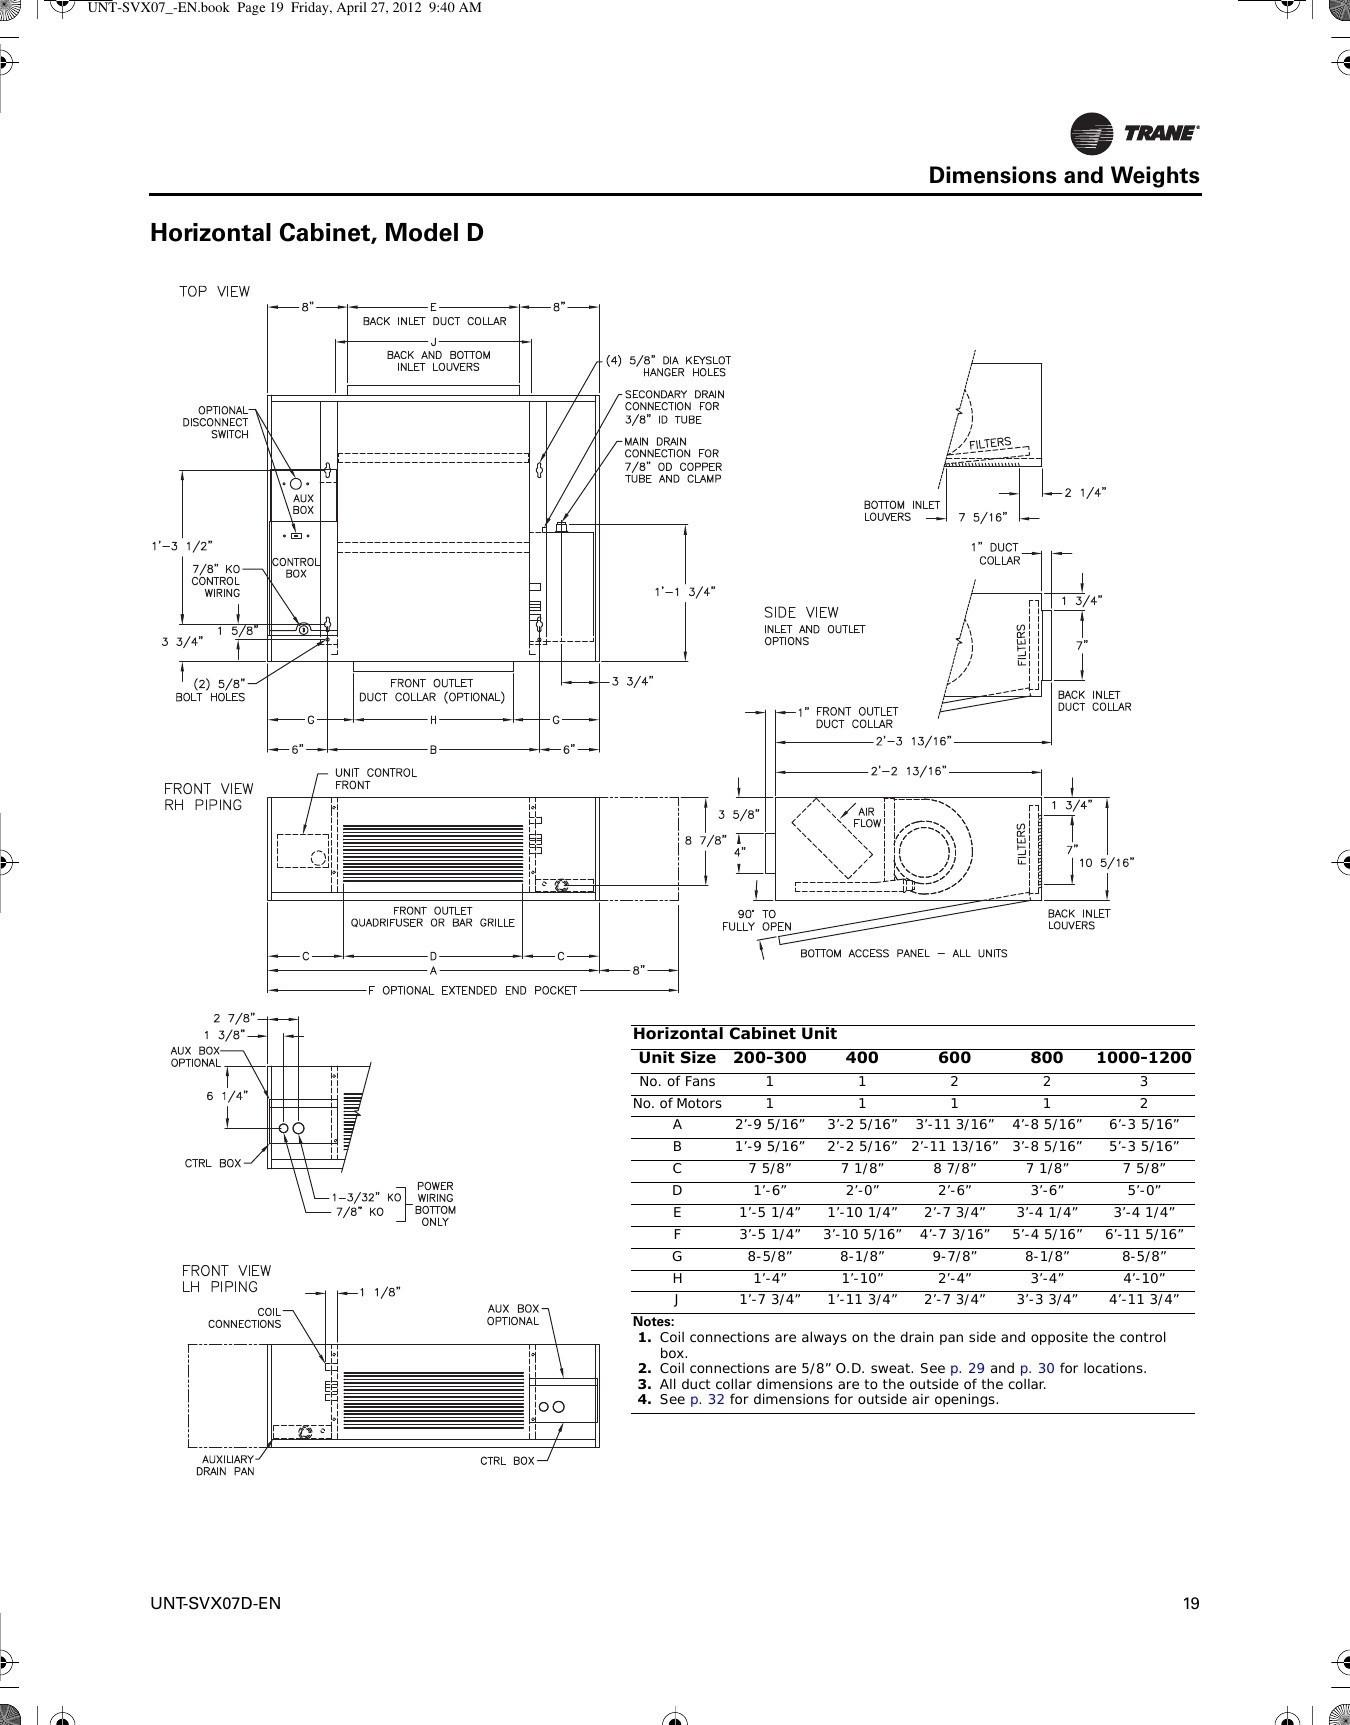 Wiring Diagram For Kib Mv22vwl